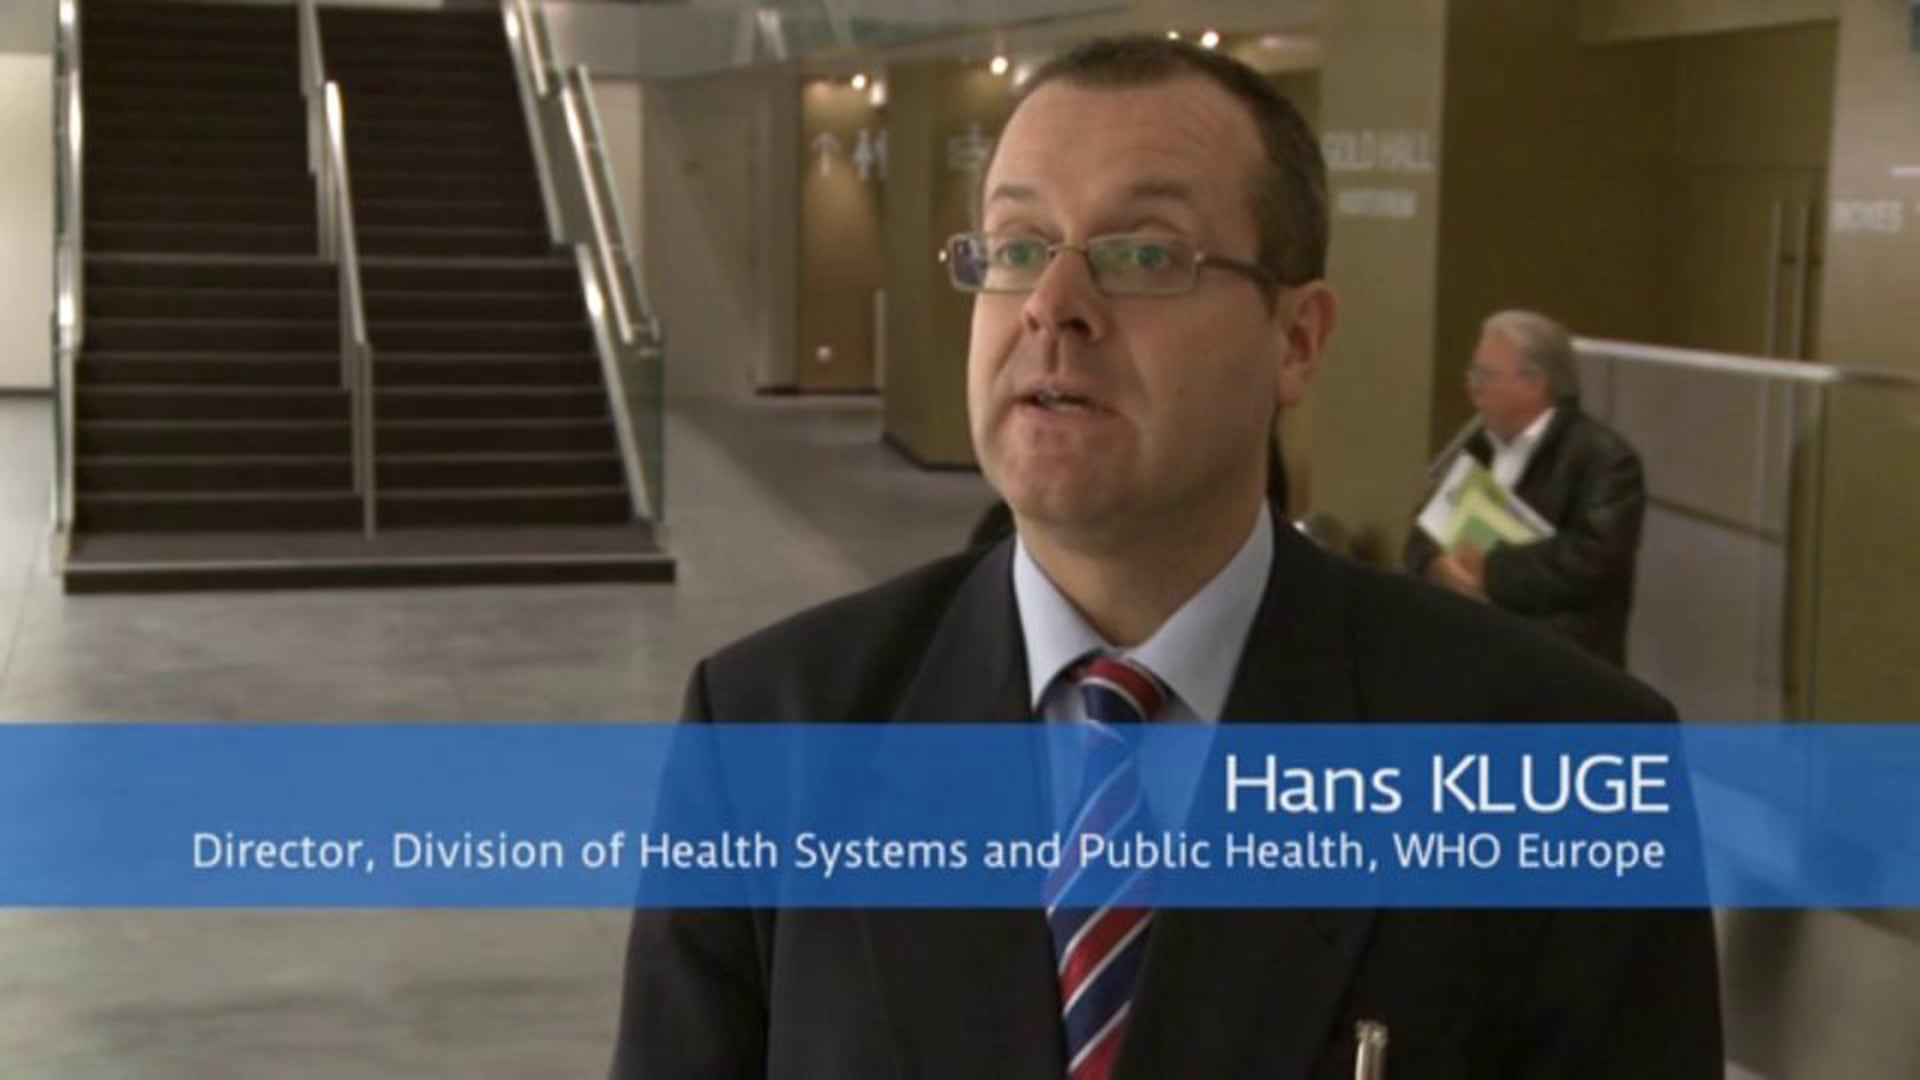 Dr. Hans Kluge talks to ASPHER about the public health workforce in the European Region